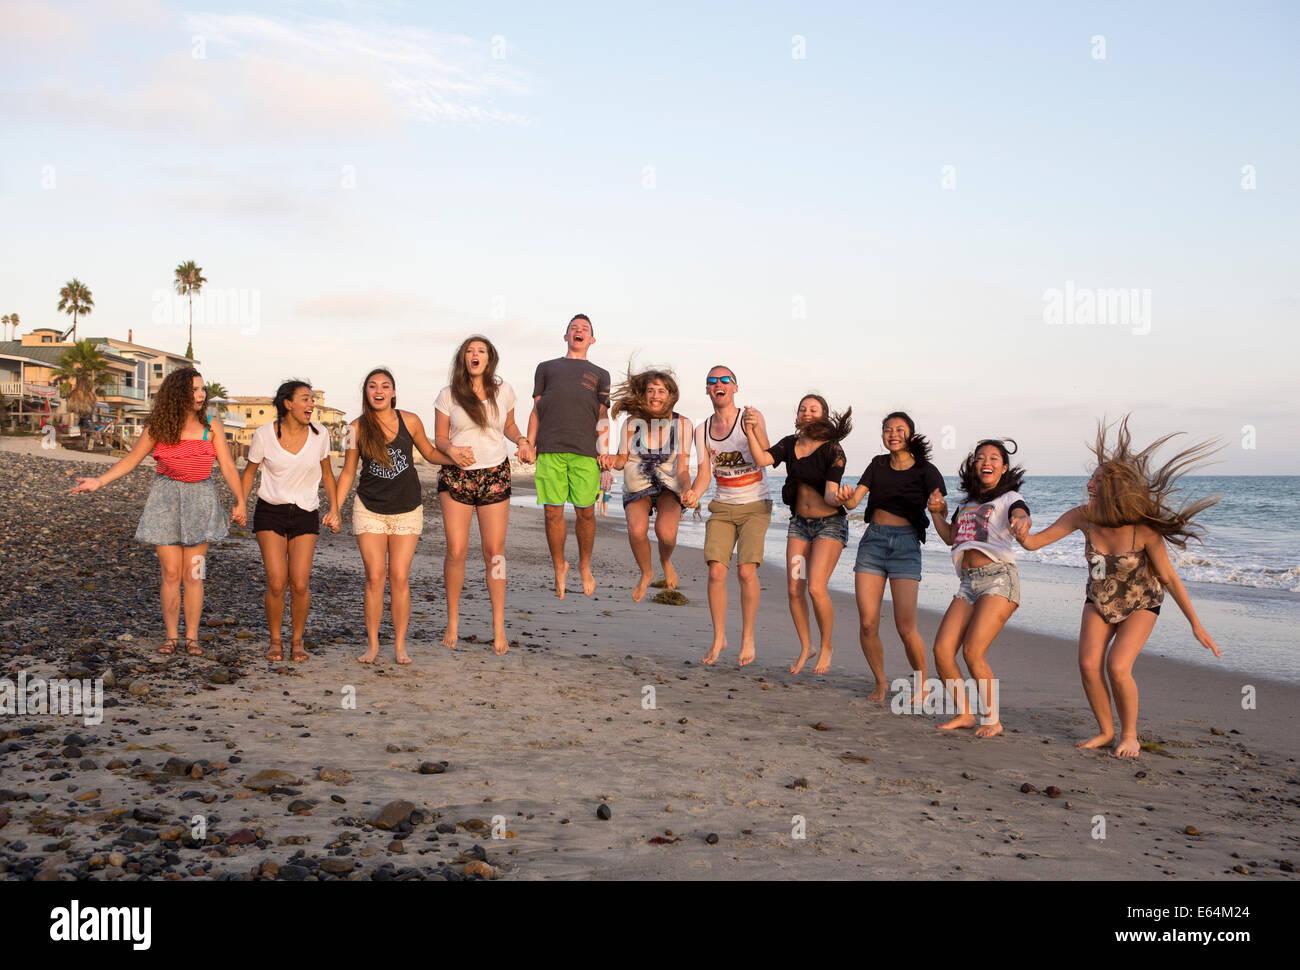 Les jeunes adultes, adolescents, Capistrano Beach, alias Capo Beach, ville de Dana Point, l'Orange County, California, United States Banque D'Images